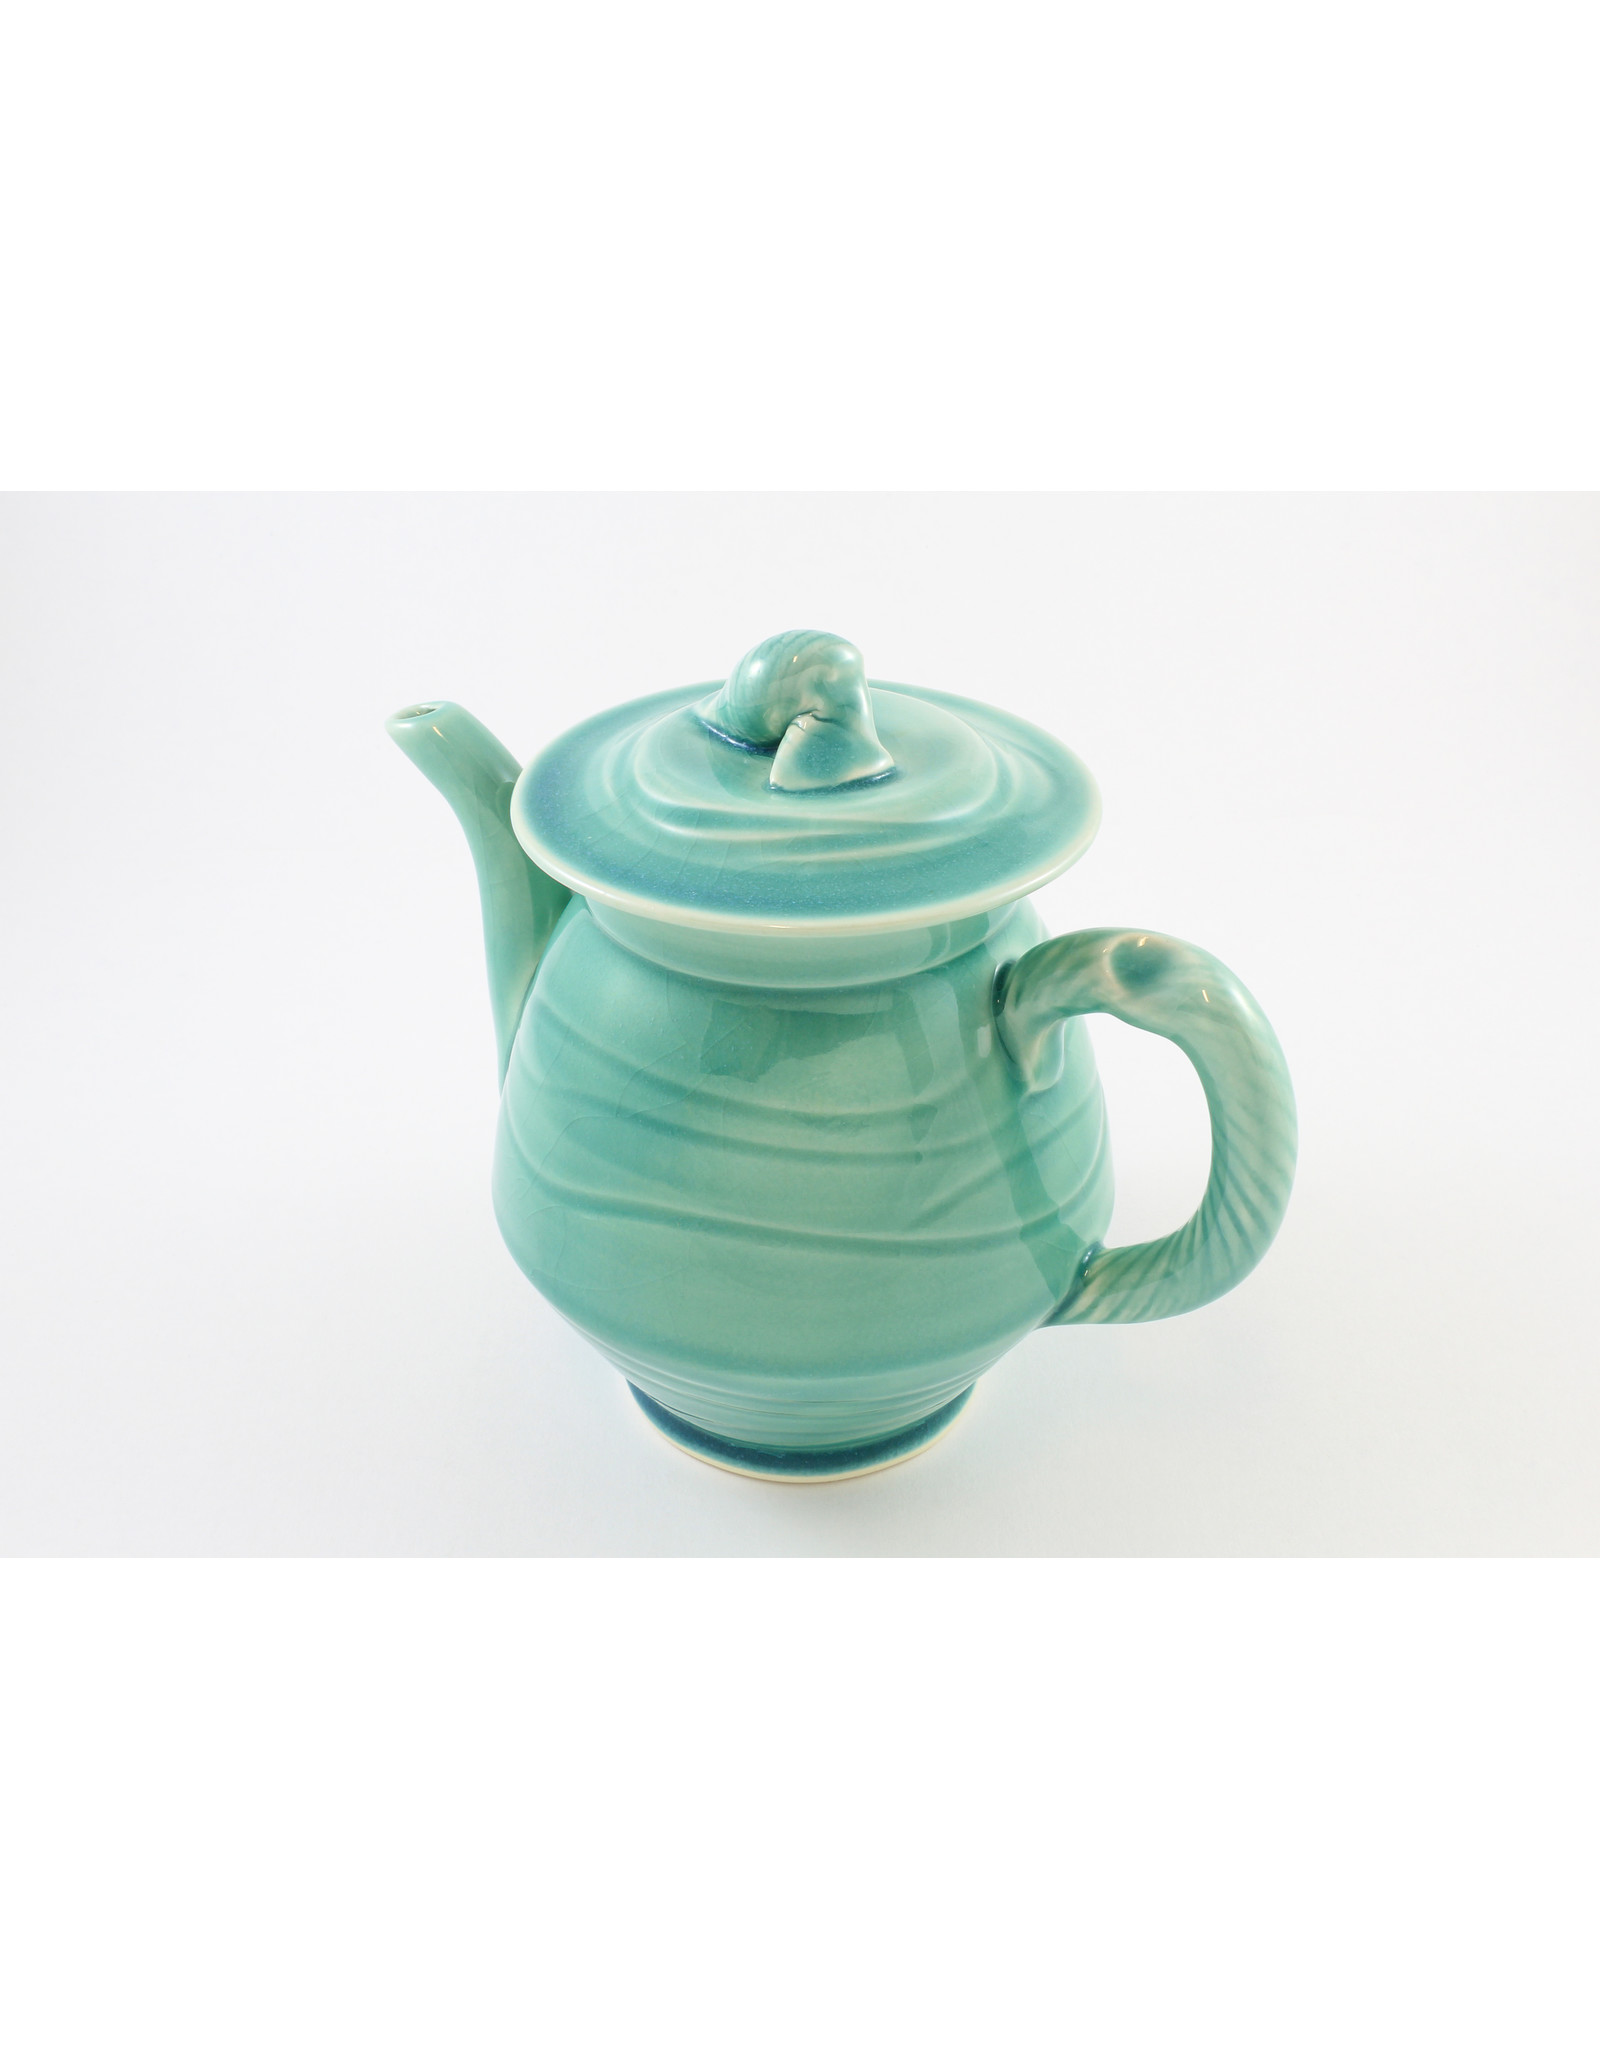 Linda Wright Teapot by Linda Wright